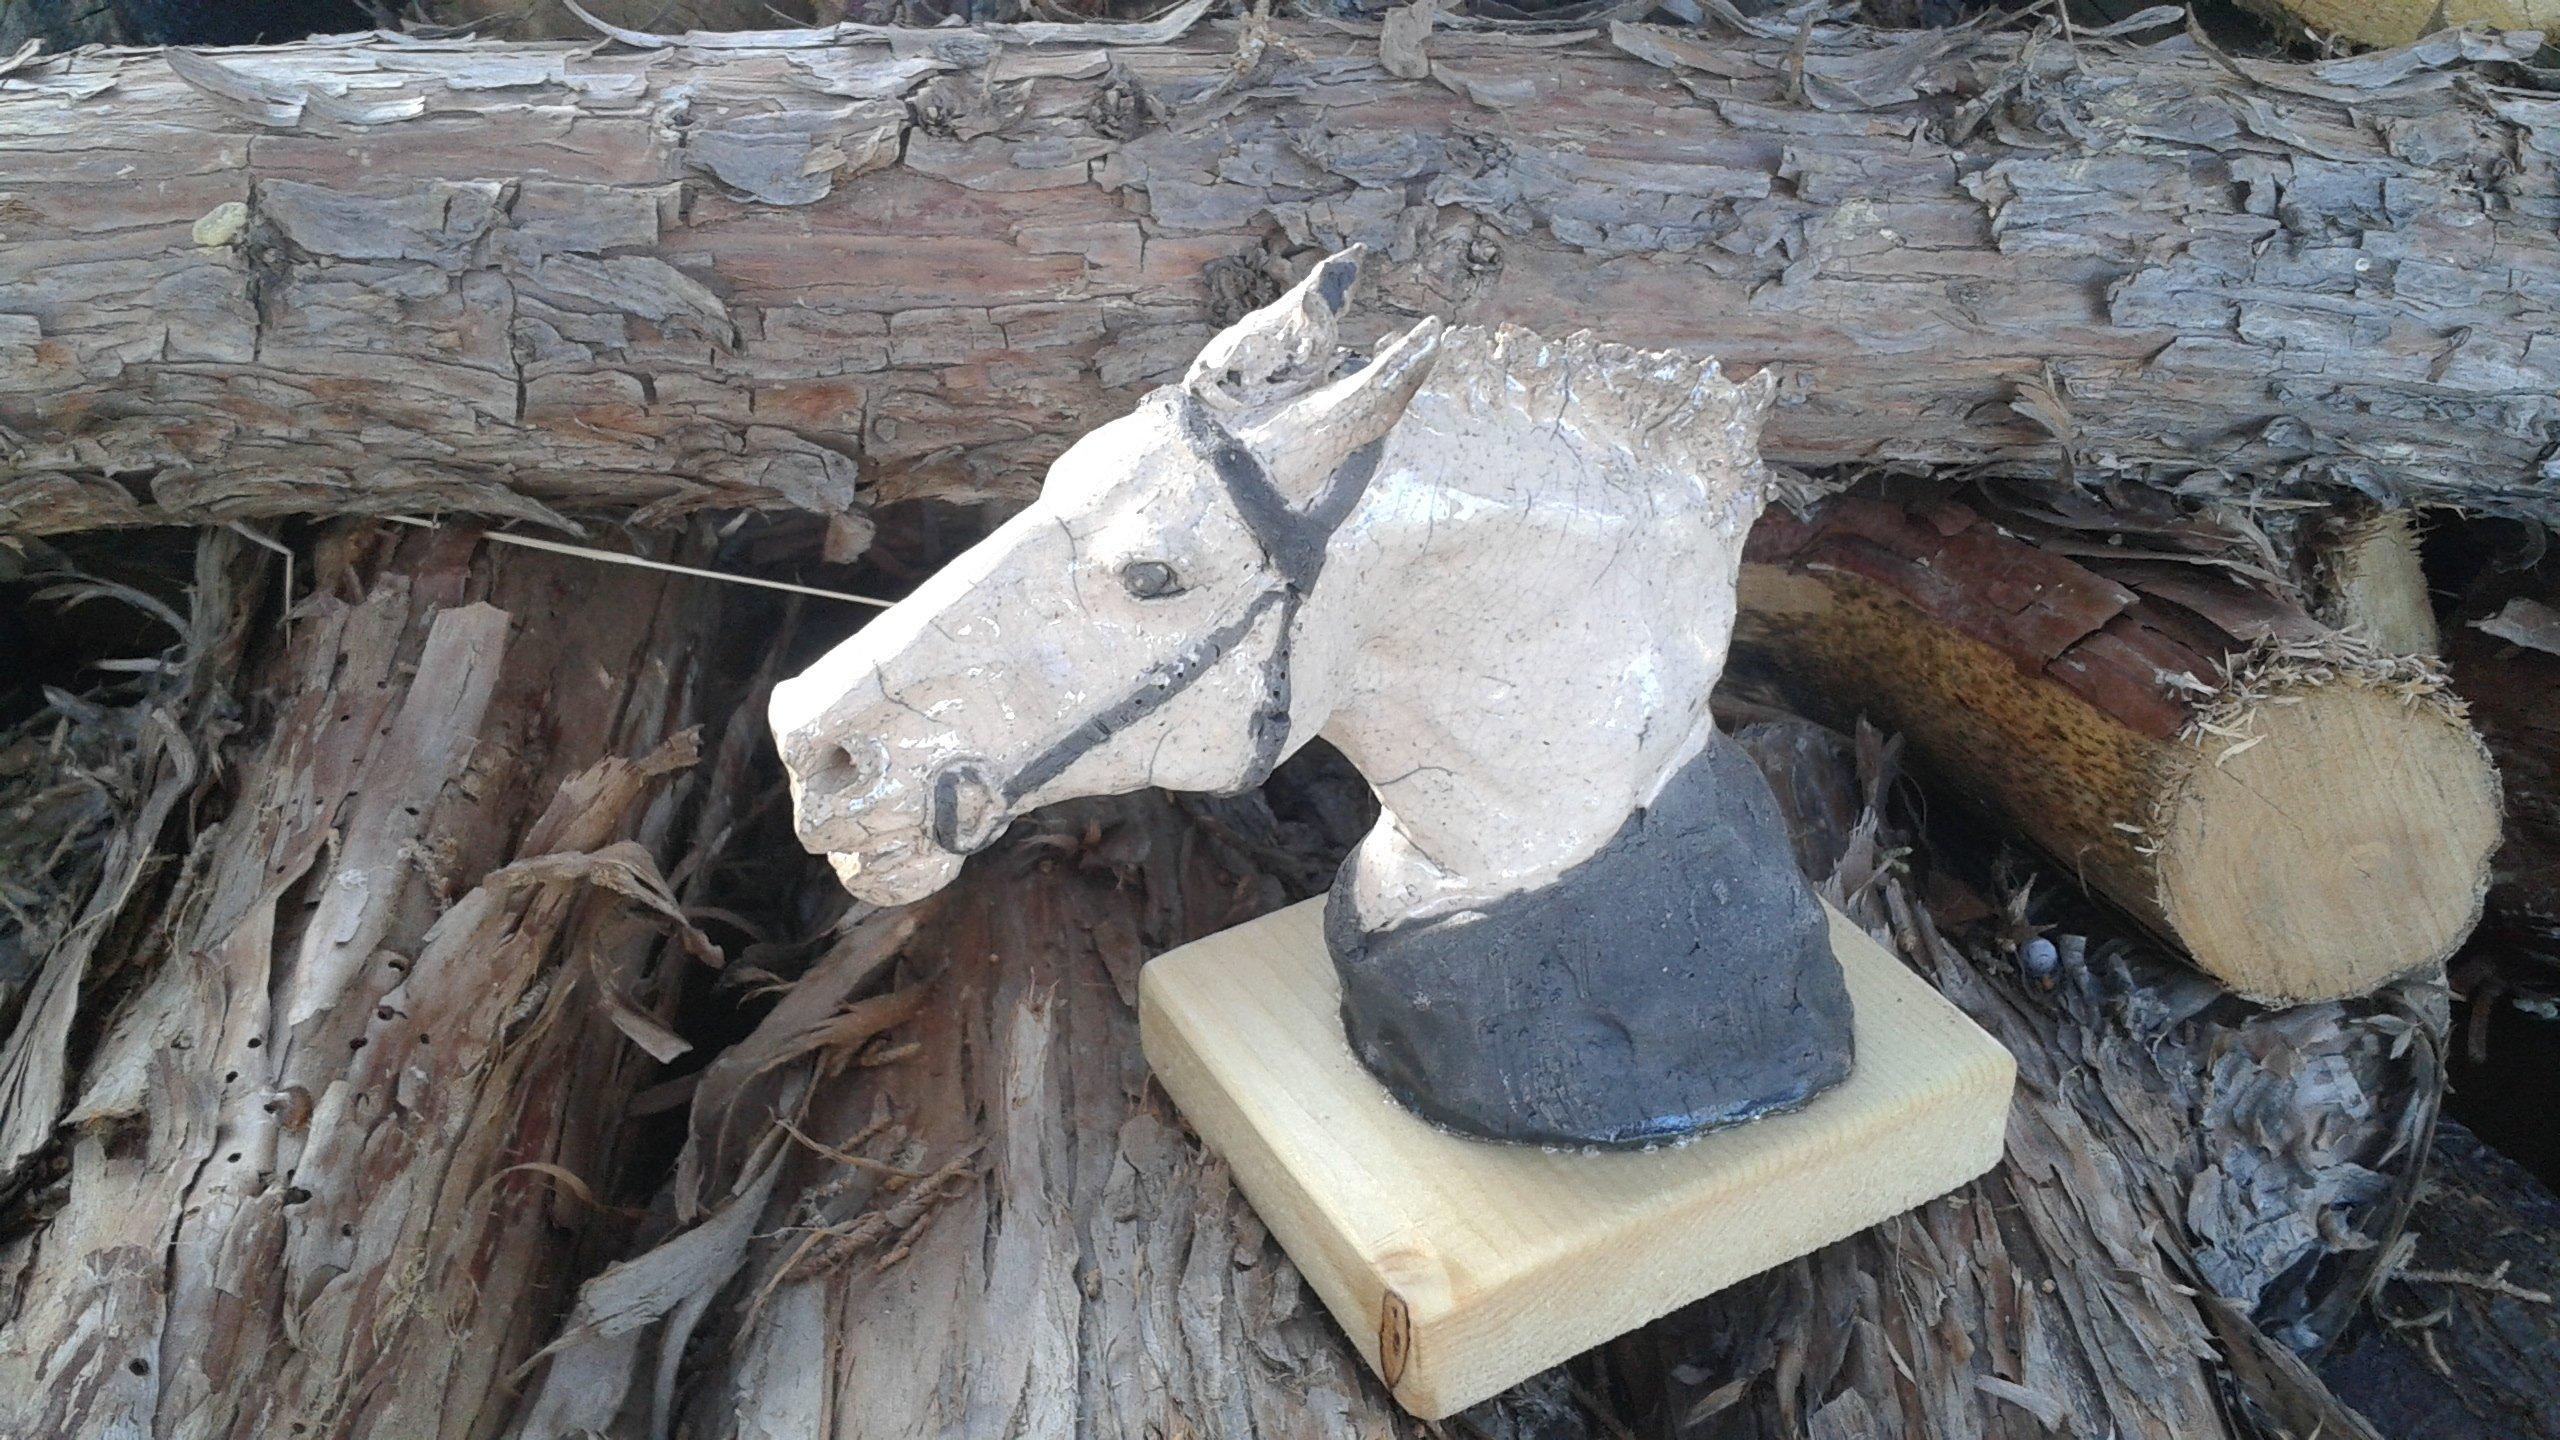 Horse and livestock clay sculpture-go-man-go.jpg